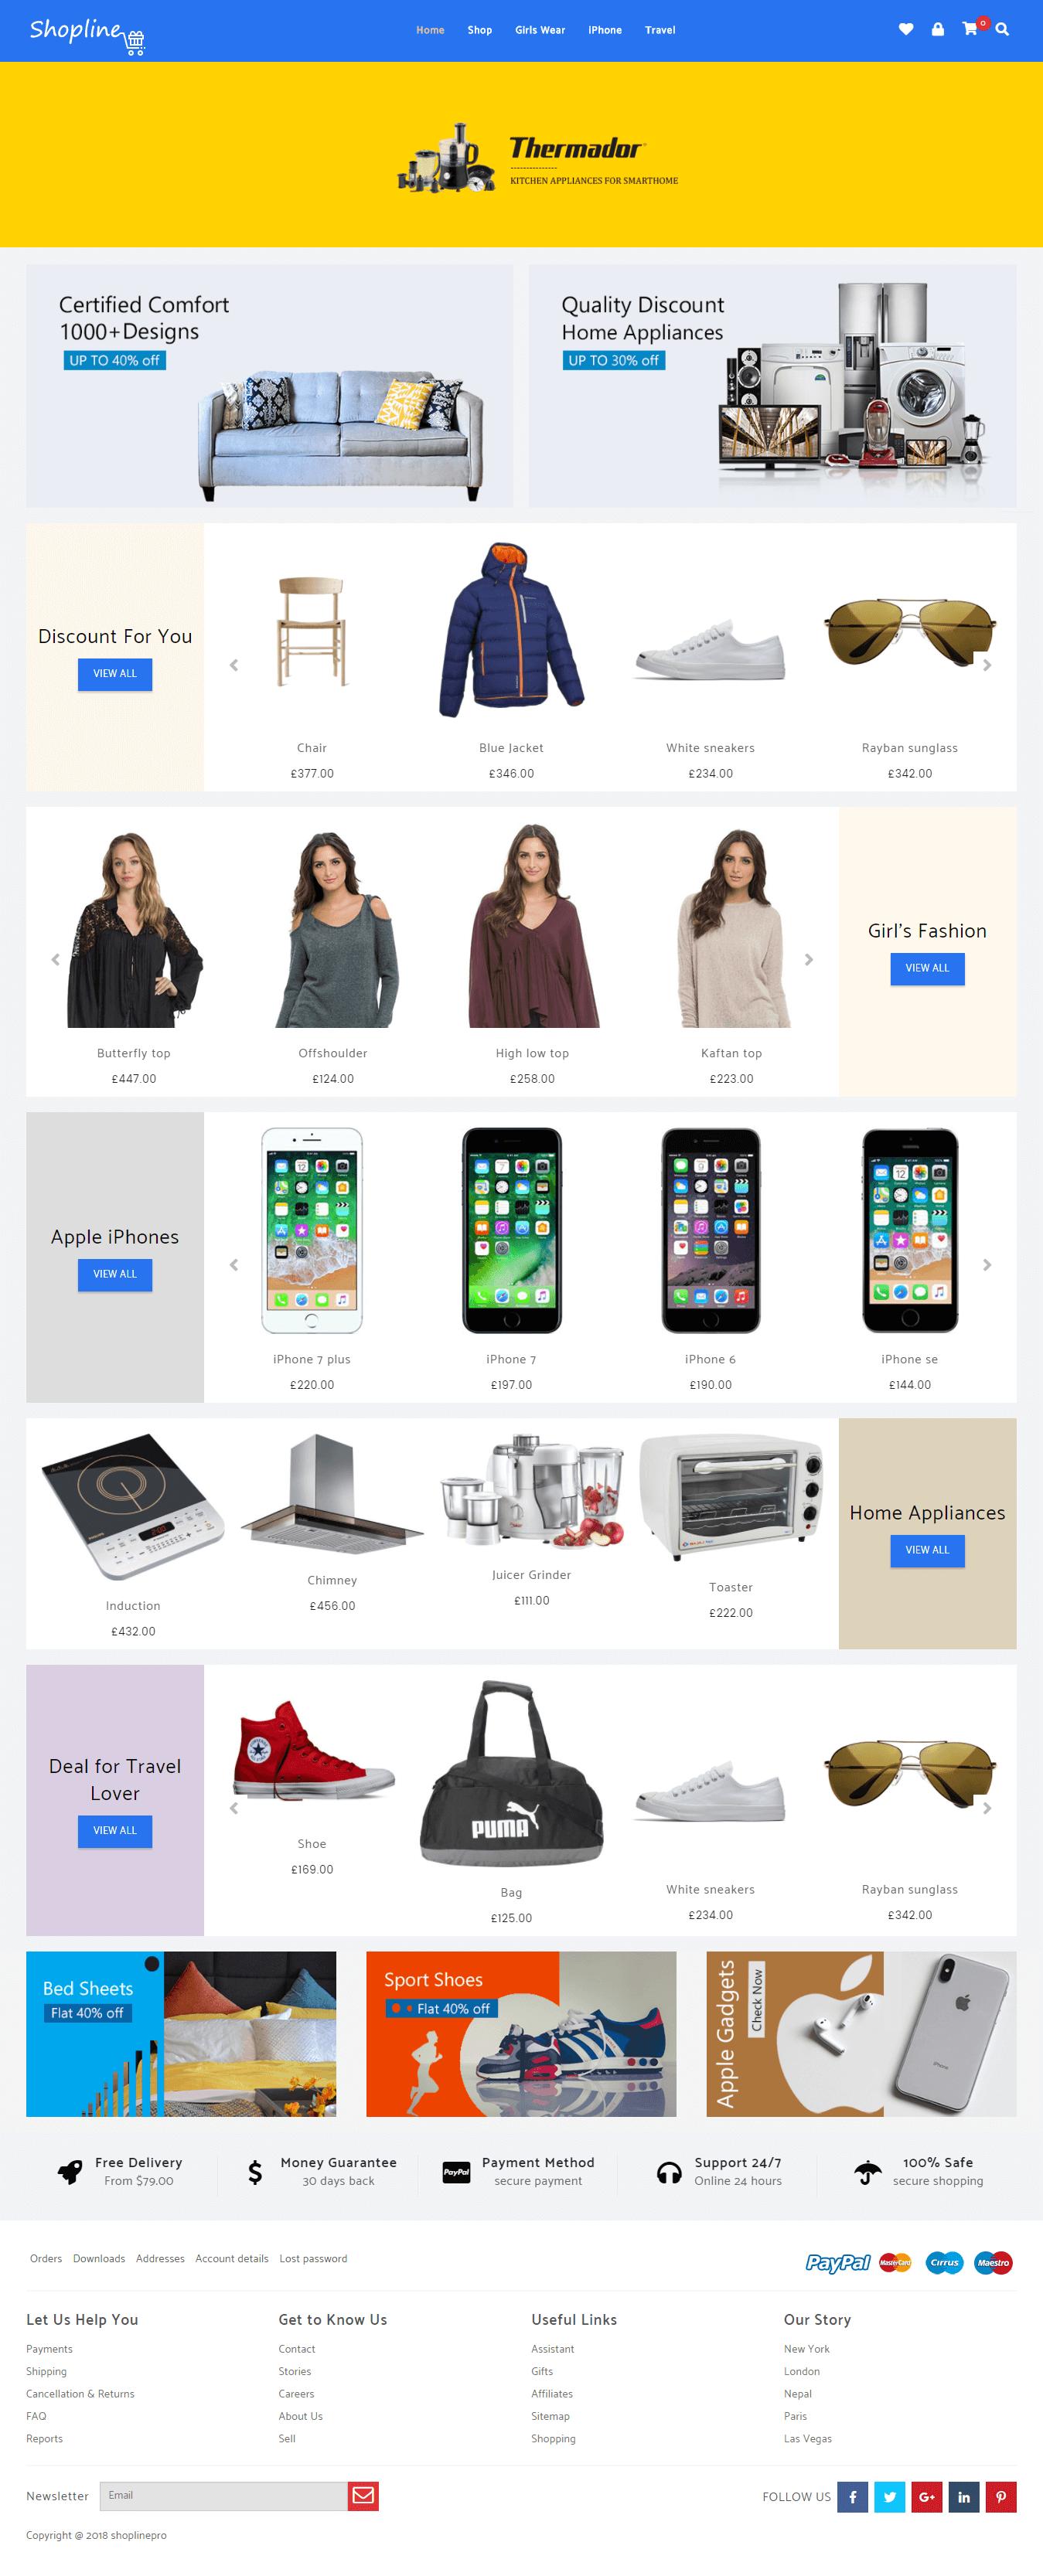 Shopline Pro Demo 2